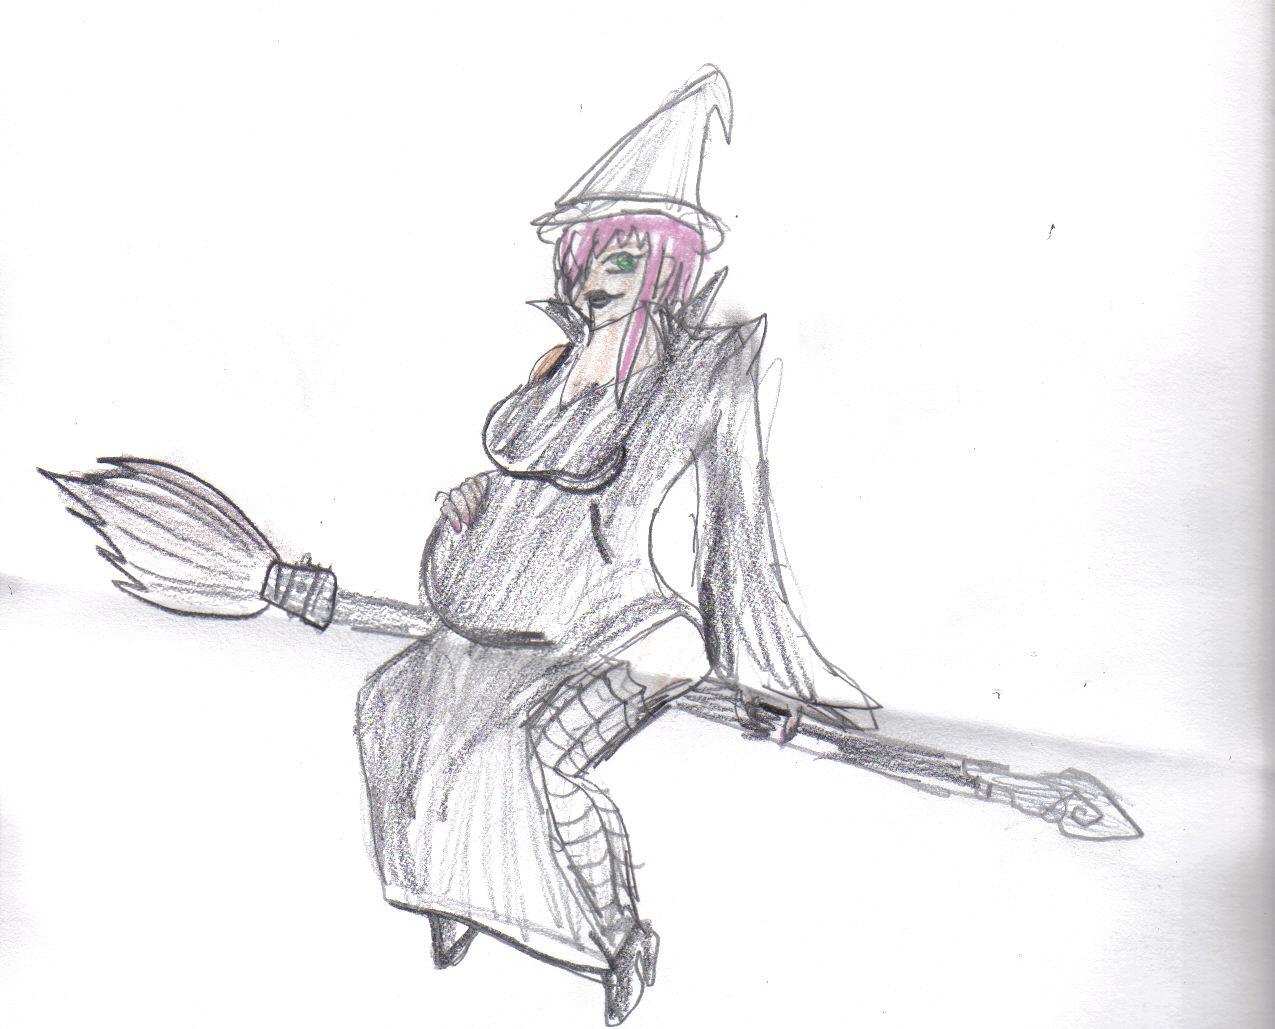 Pregnant_Witch_by_Ninshinobi.jpg